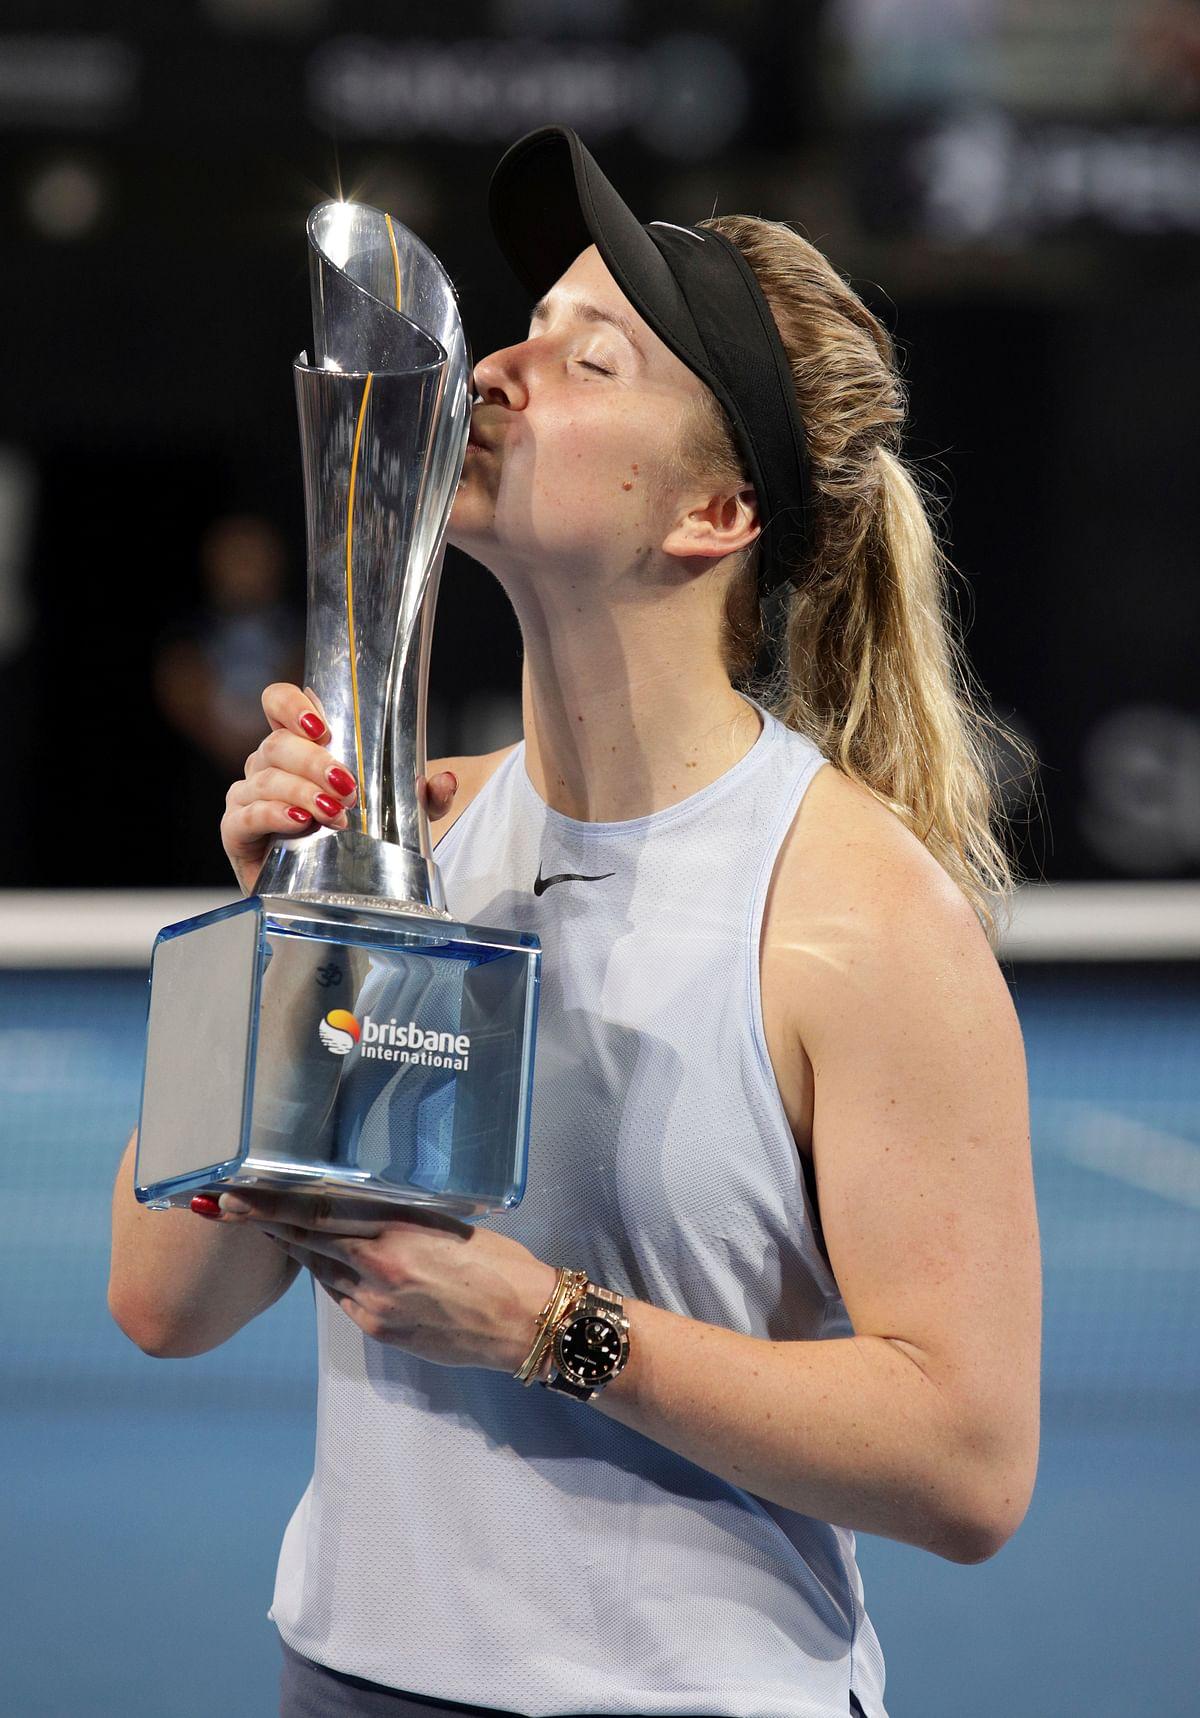 Elina Svitolina of Ukraine holds the winners trophy after winning her finals match against Aliaksandra Sasnovich of Belarus 6-2, 6-1 during the Brisbane International tennis tournament in Brisbane, Australia, Saturday, Jan. 6, 2018.<a></a>